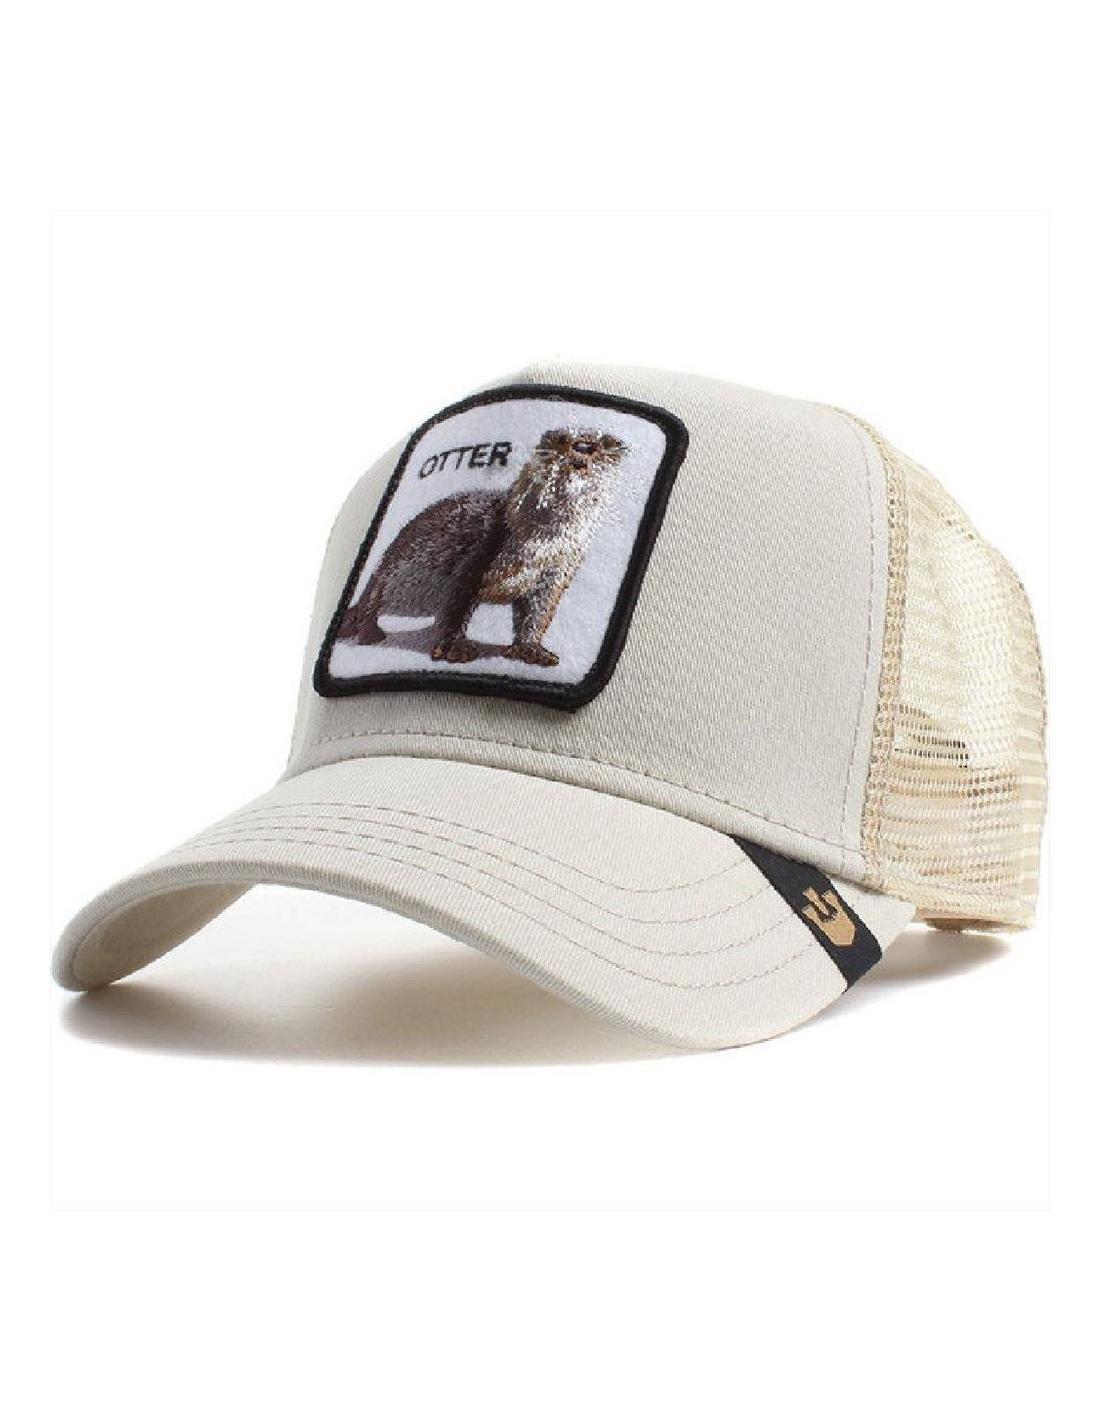 f514192453cb4 Goorin Bros Otter White Stone Animal Farm